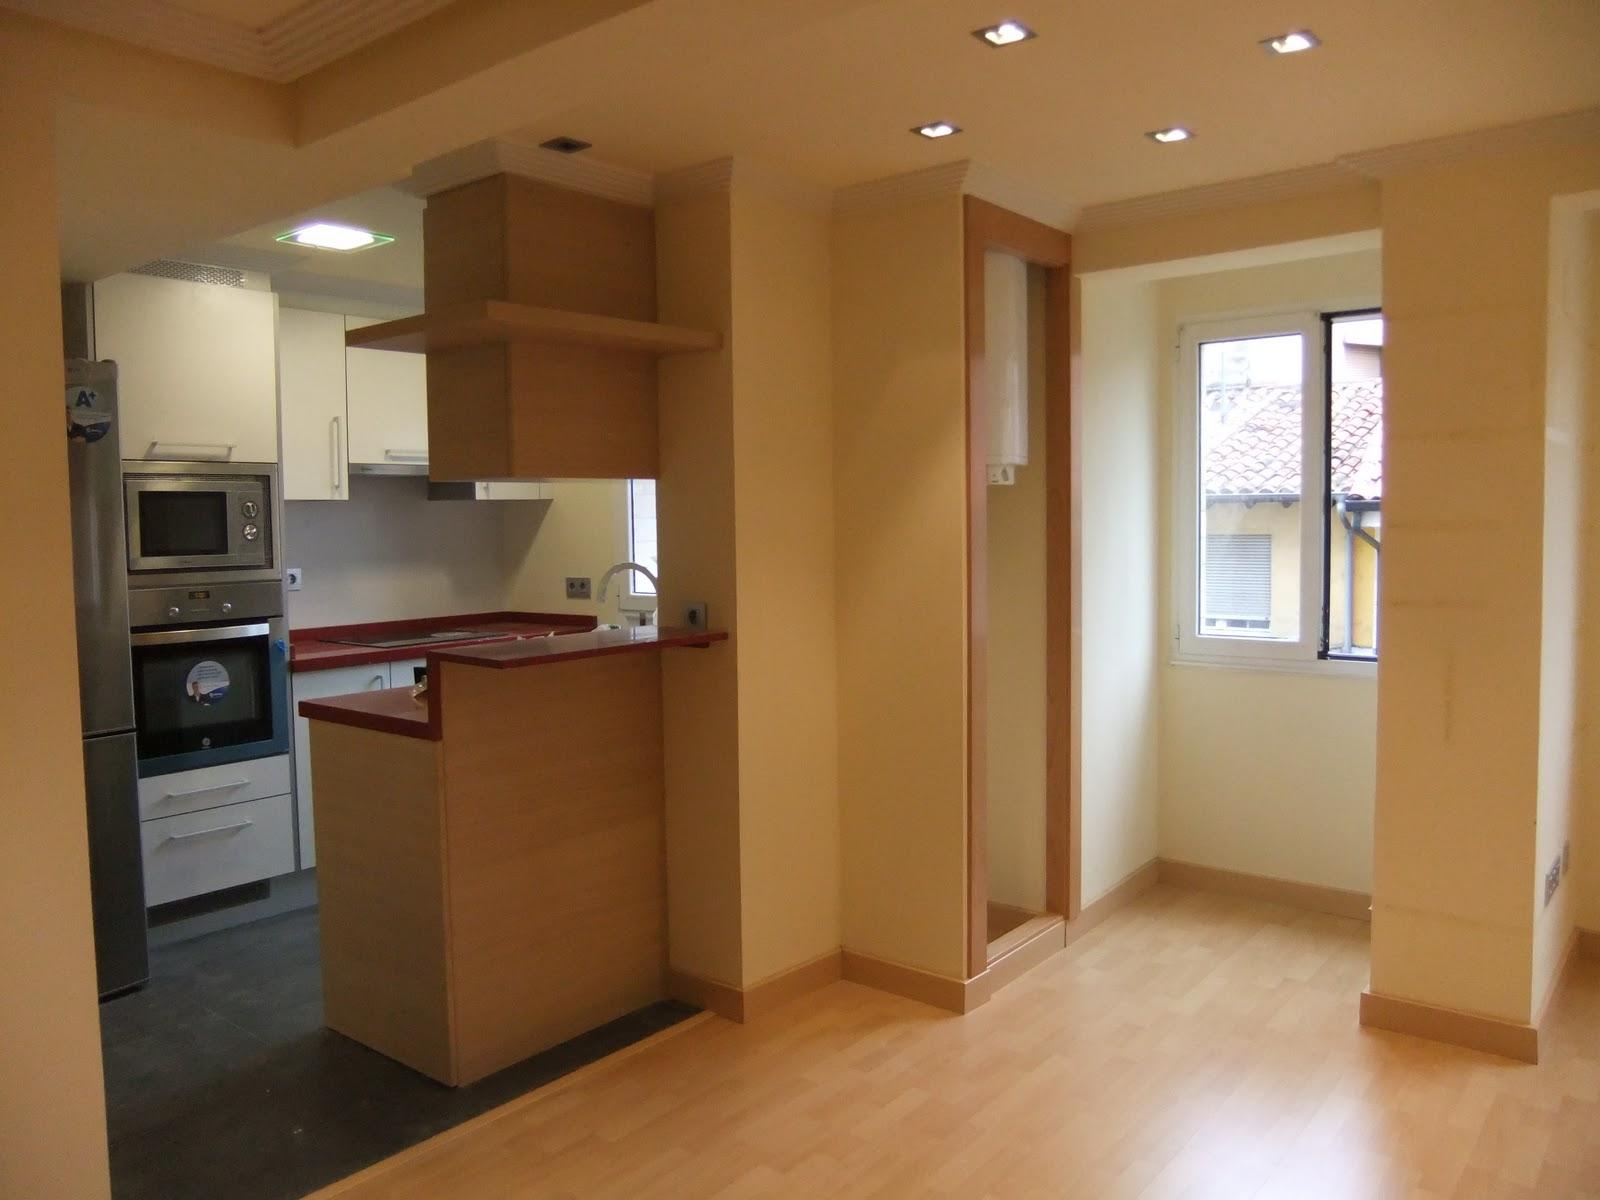 Interiorismo y decoracion lola torga peque o apartamento for Cocinas para pisos pequenos